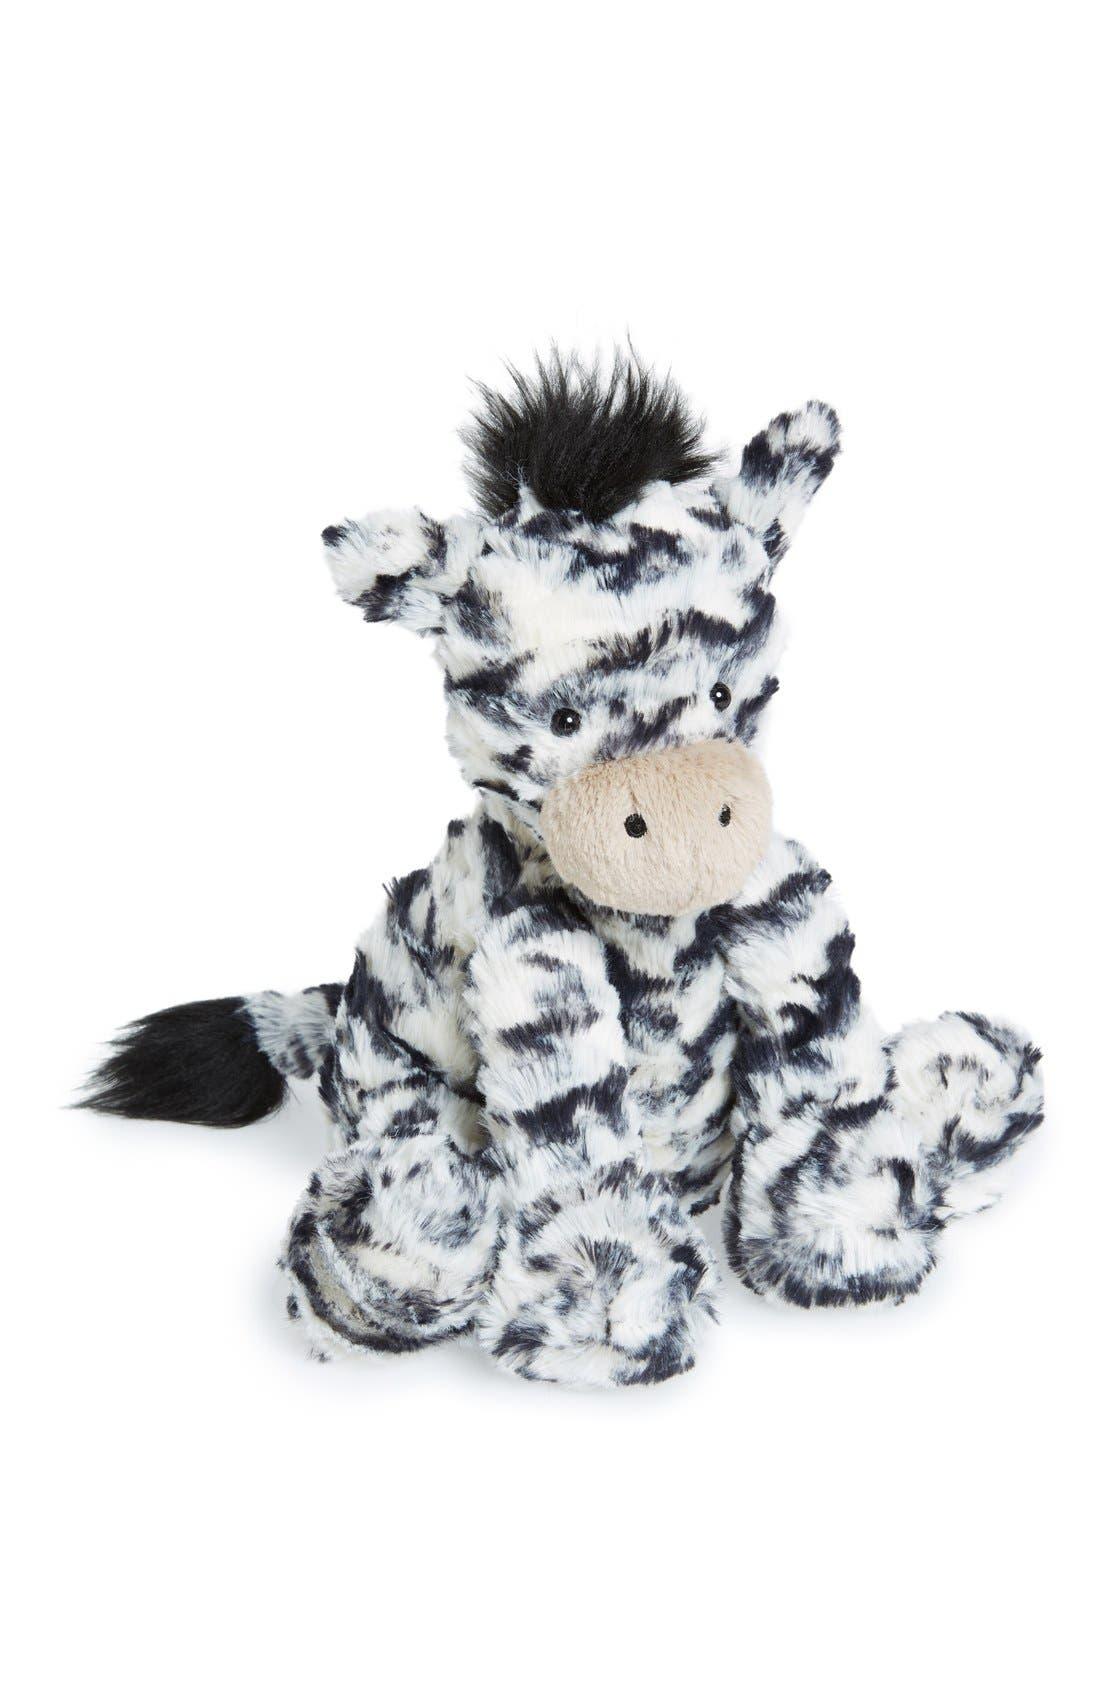 Jellycat 'Fuddlewuddle Zebra' Stuffed Animal